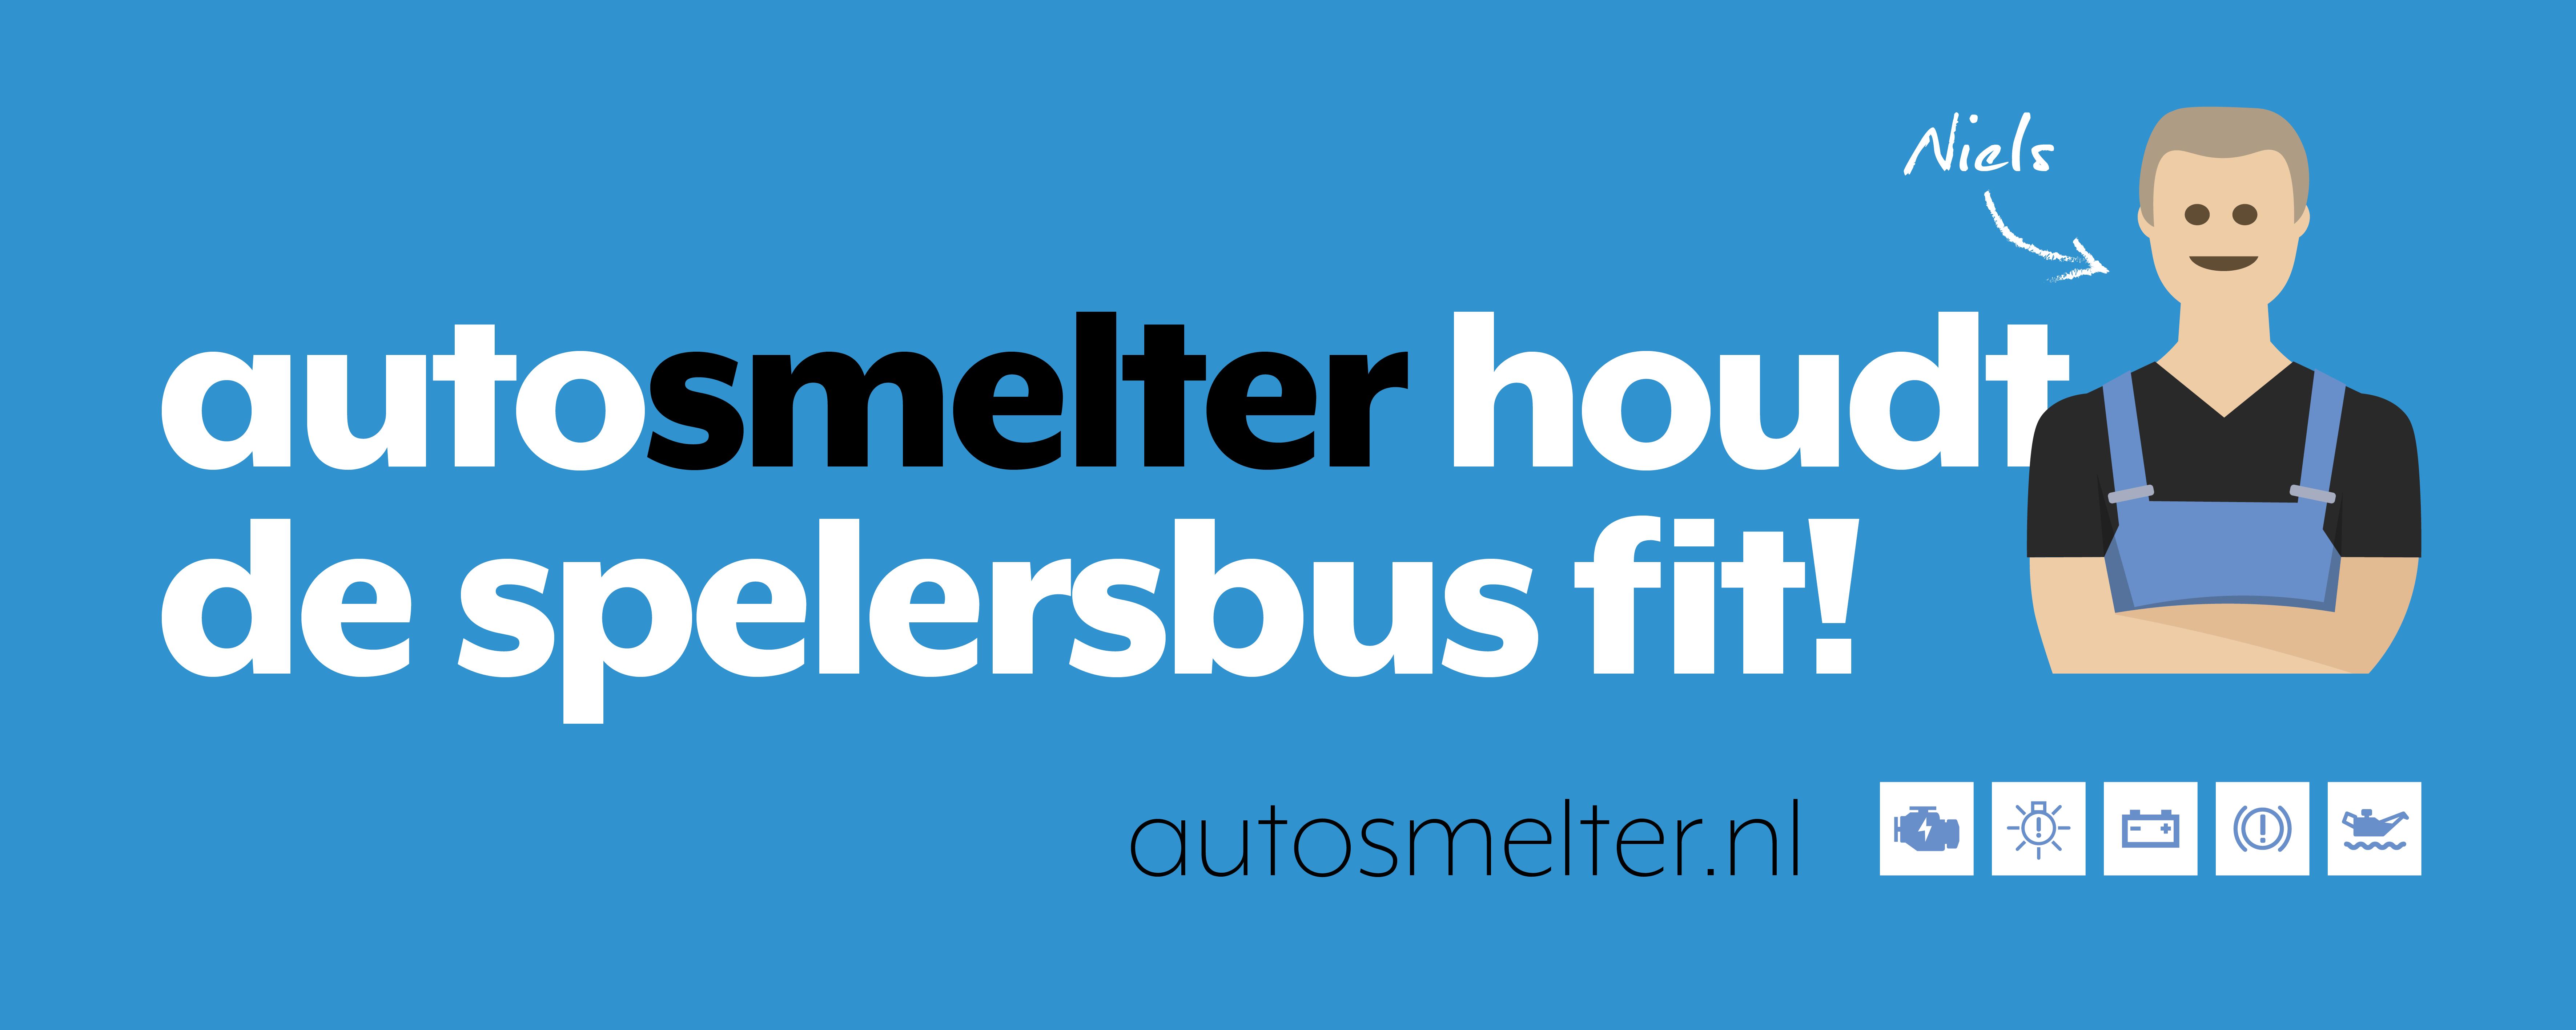 Auto-Smelter-sponsorbord